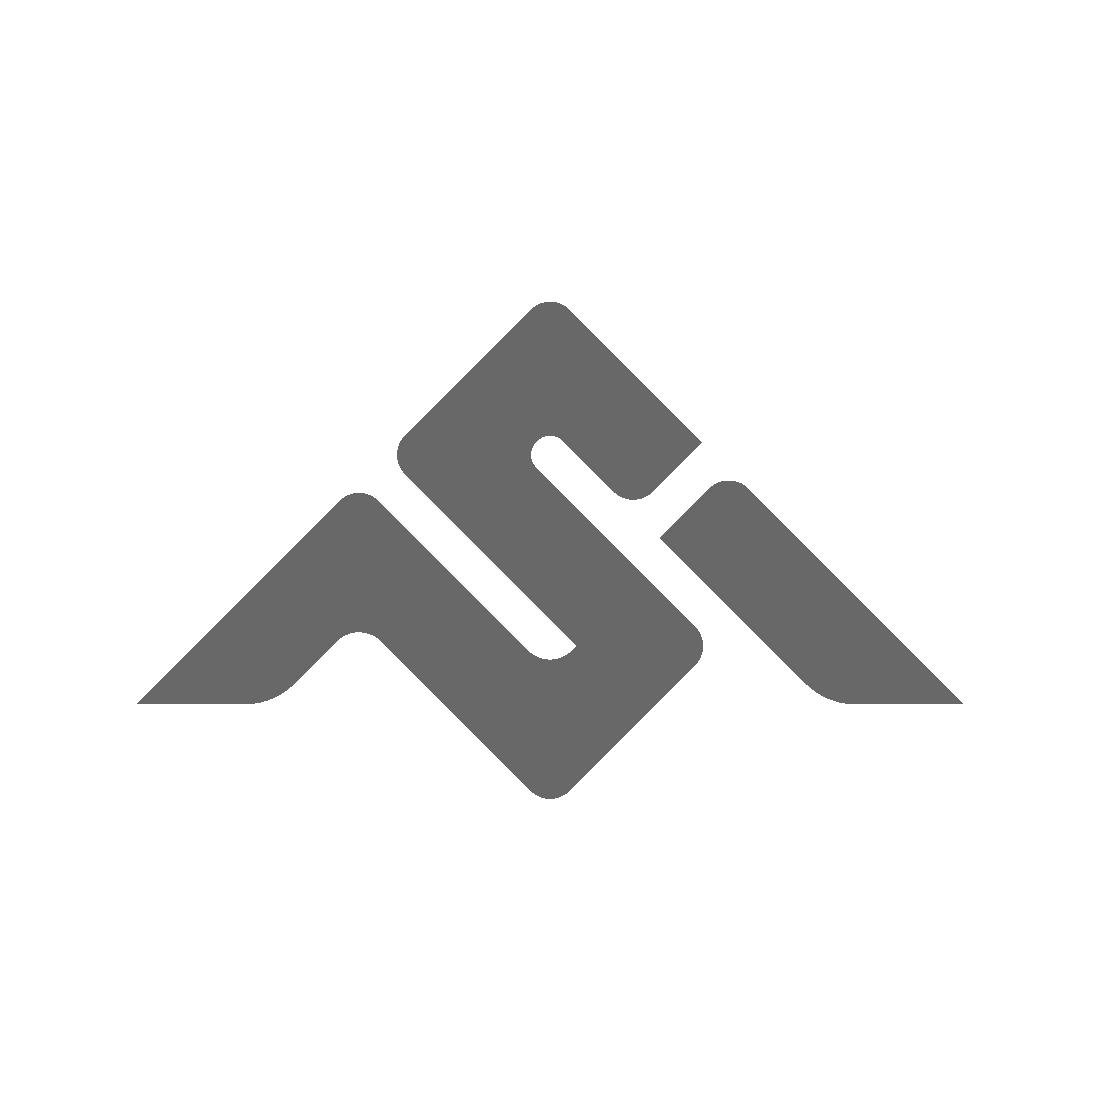 roue gripper 110 mm proto magasin en ligne pi ce pour trottinette freestyle sportmania. Black Bedroom Furniture Sets. Home Design Ideas